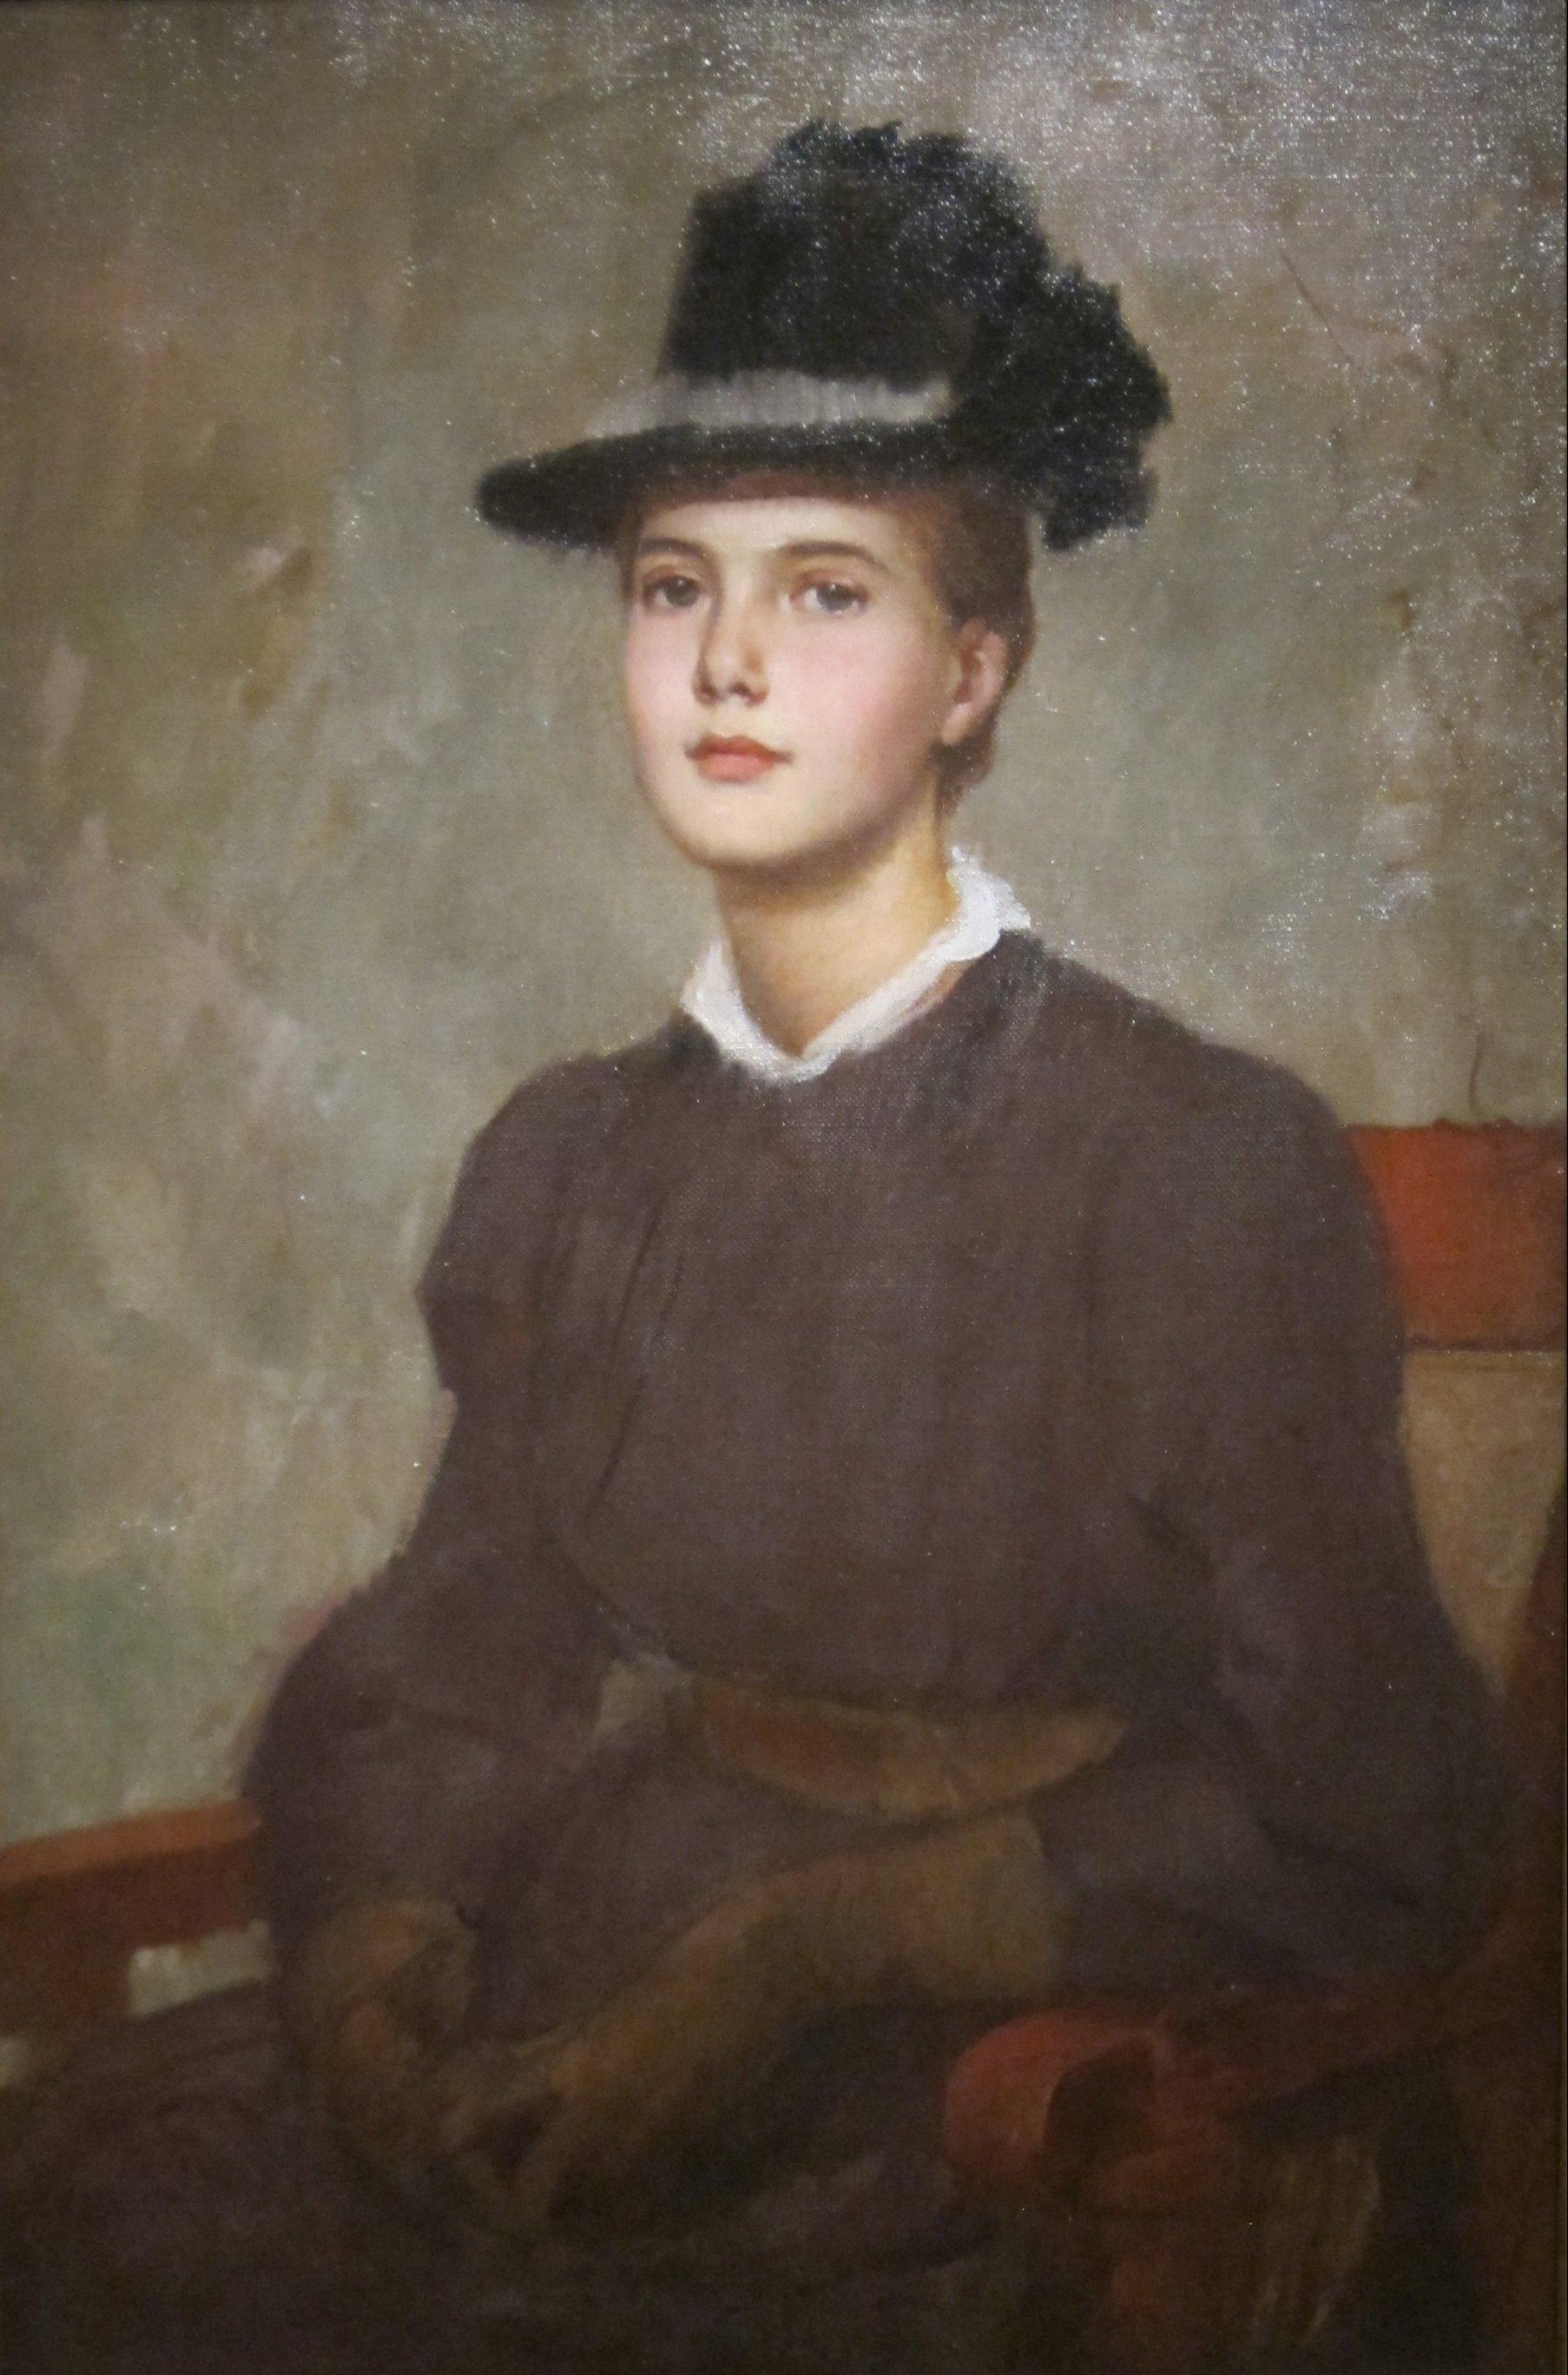 University Of Cincinati >> File:'Marie Danforth Page' by Frank Duveneck, Cincinnati ...